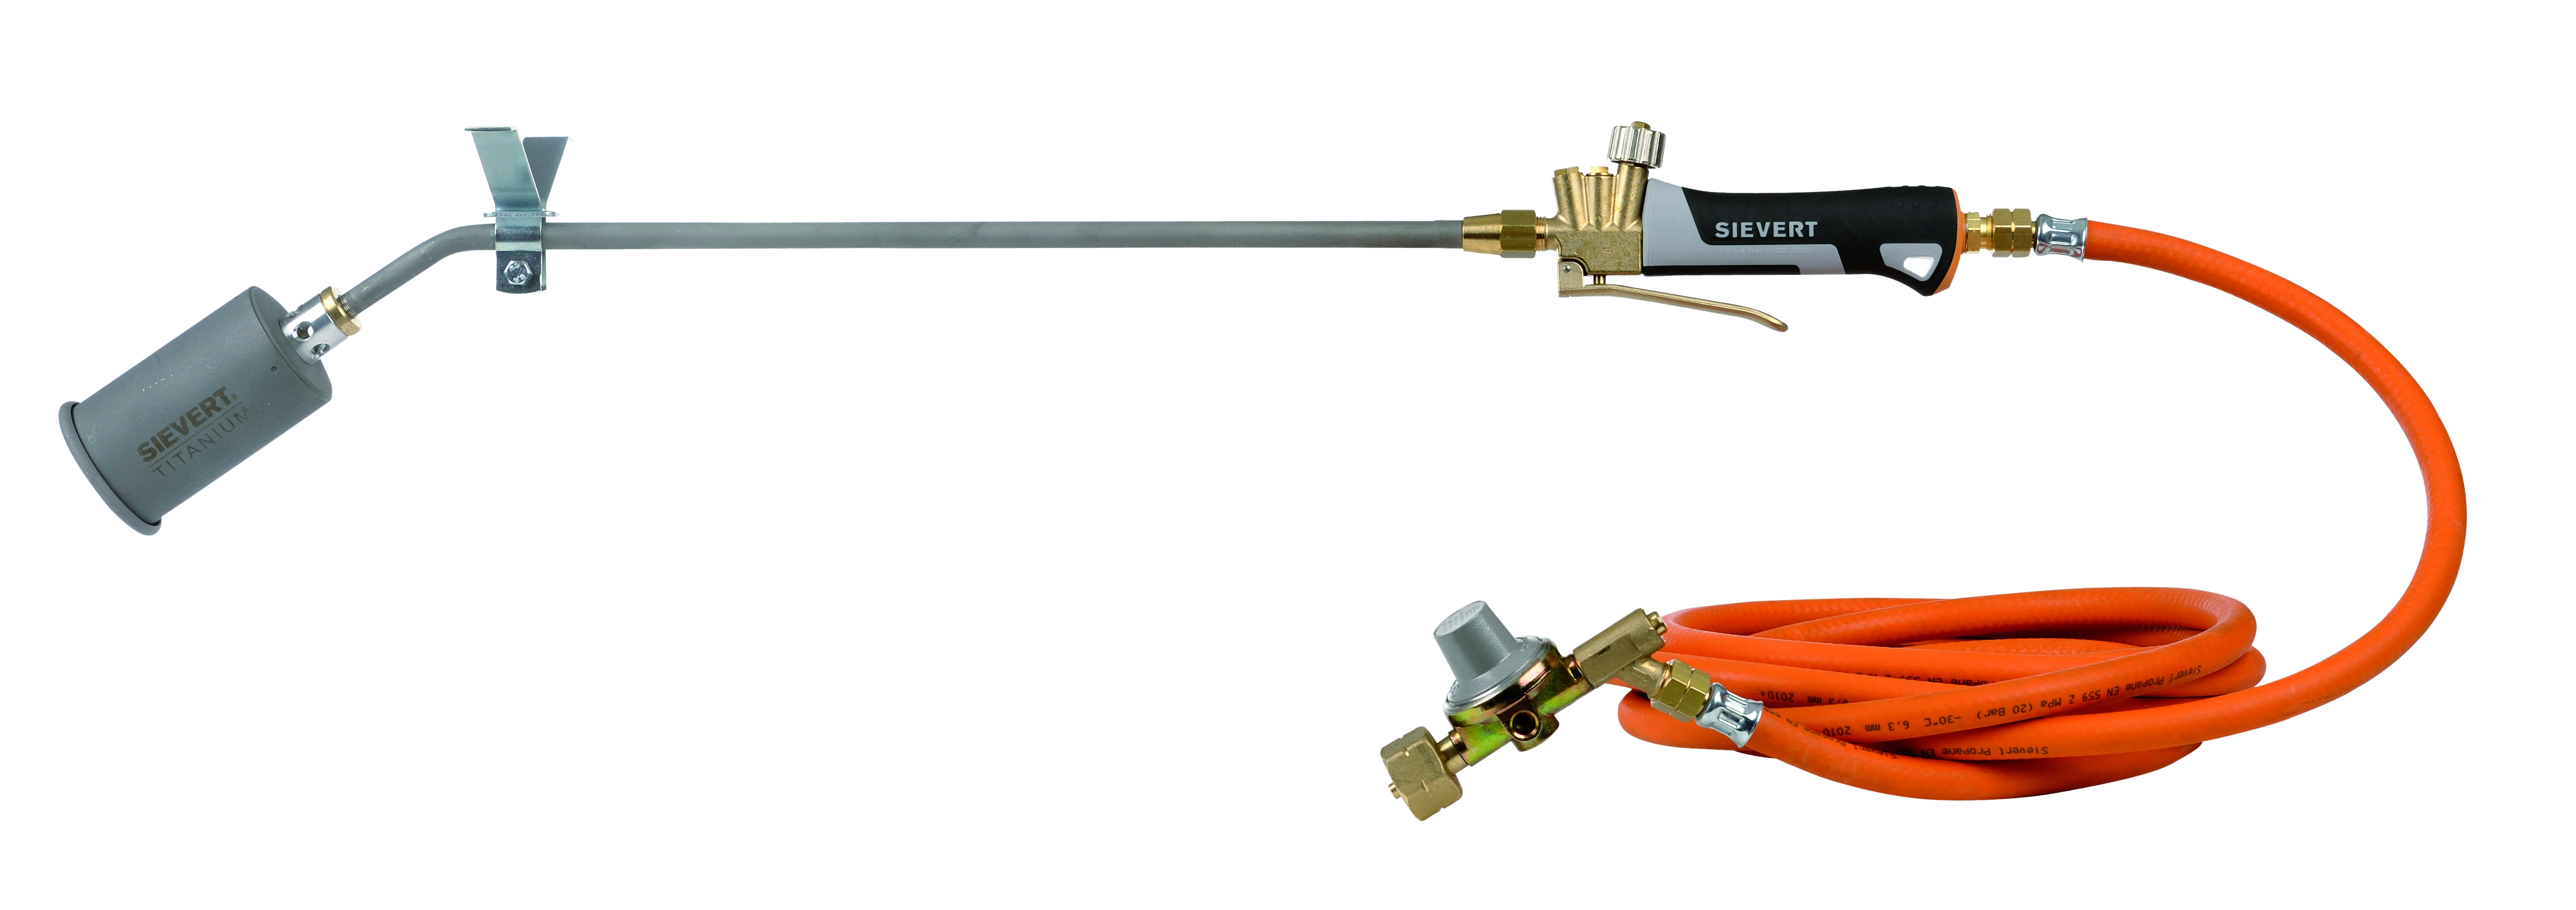 5 x Brennerkappe kurz WIG TIG Schweißbrenner SR 17//SR 18//SR 26 57Y04 7121053